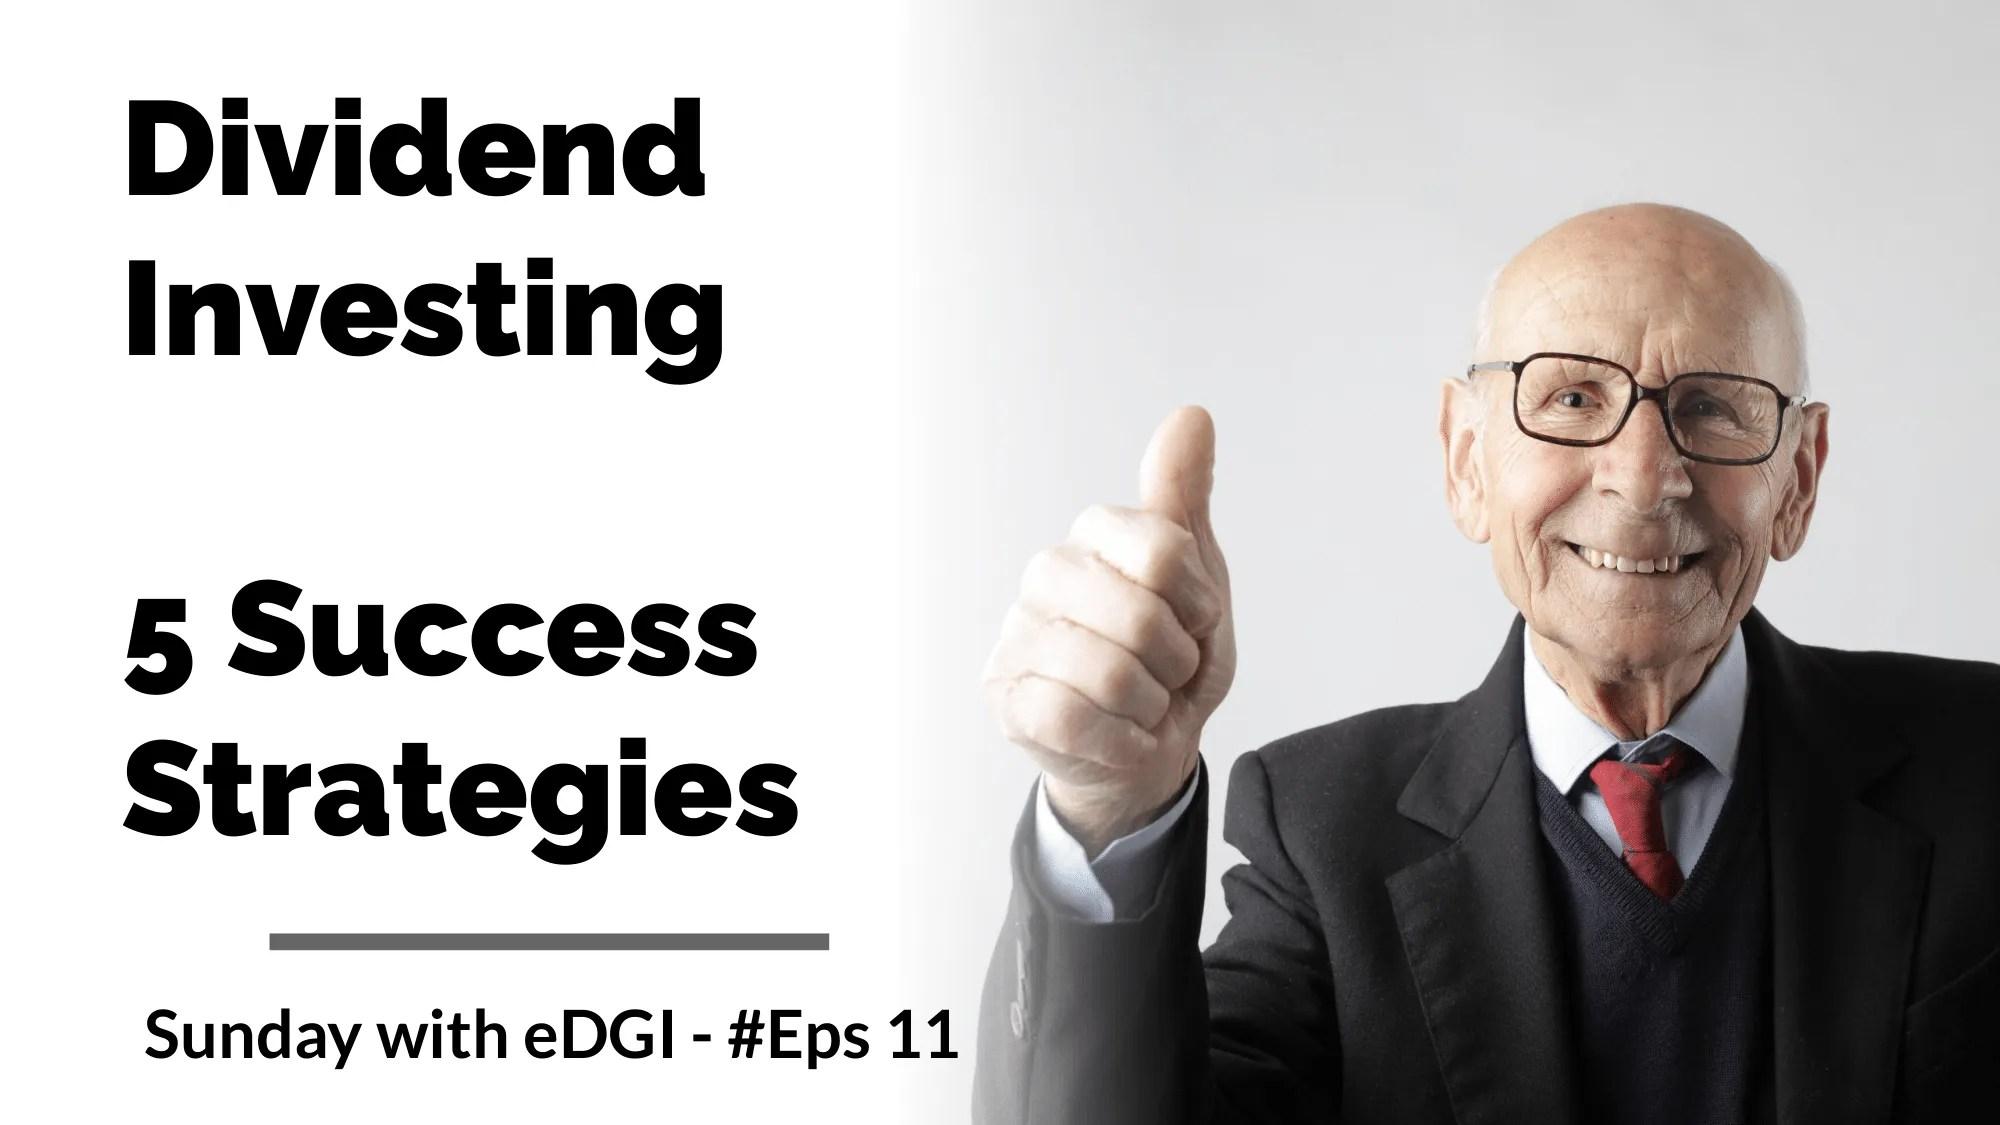 Dividend Investing Success Strategies